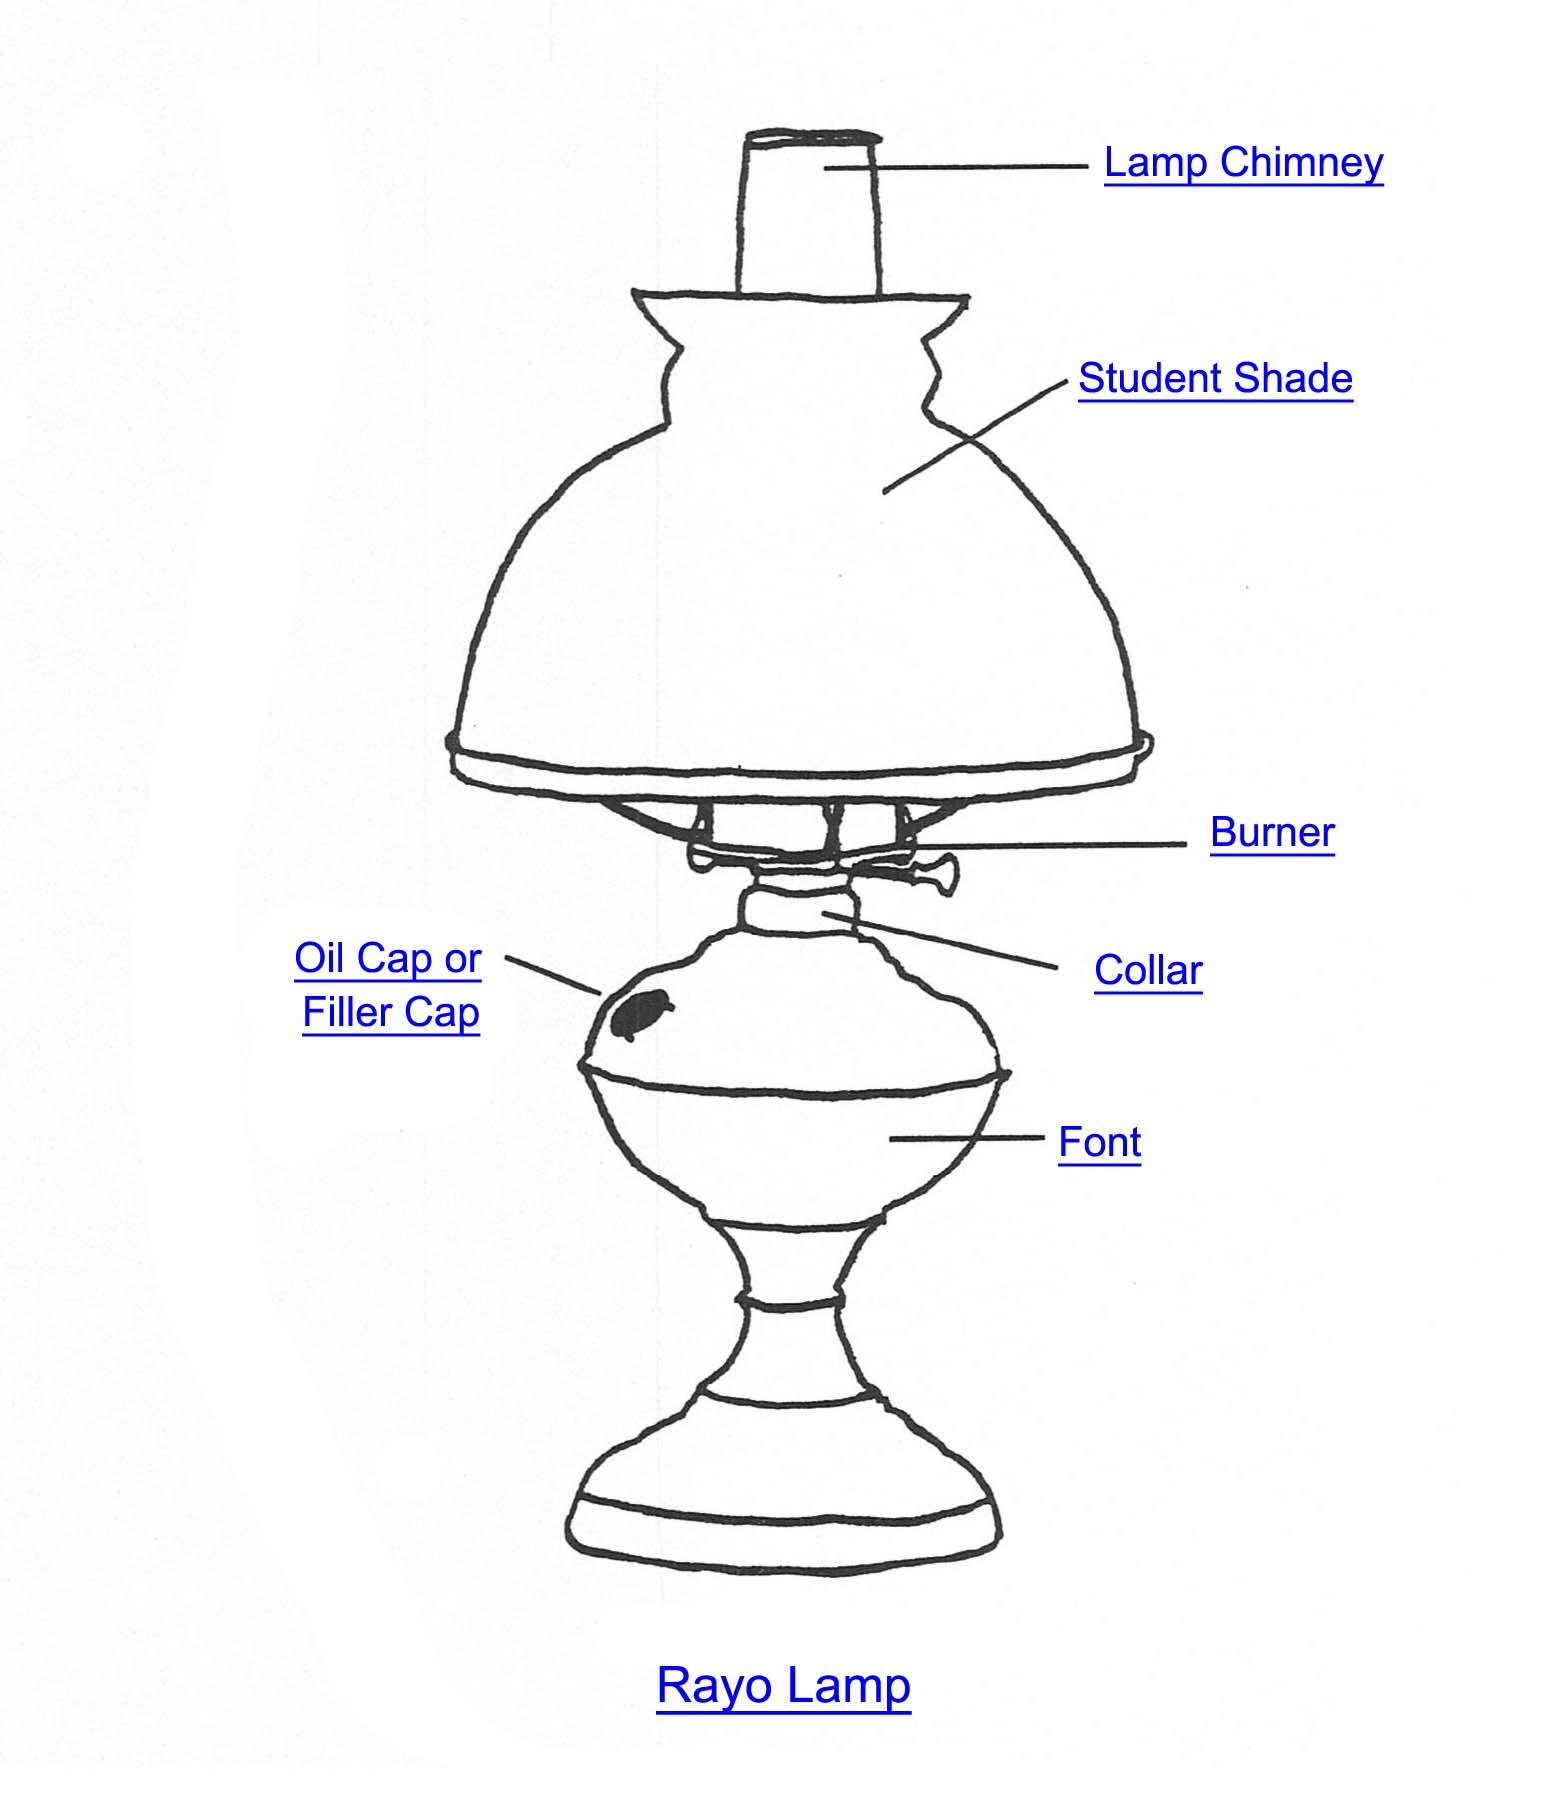 Rayo Lamp Part Index